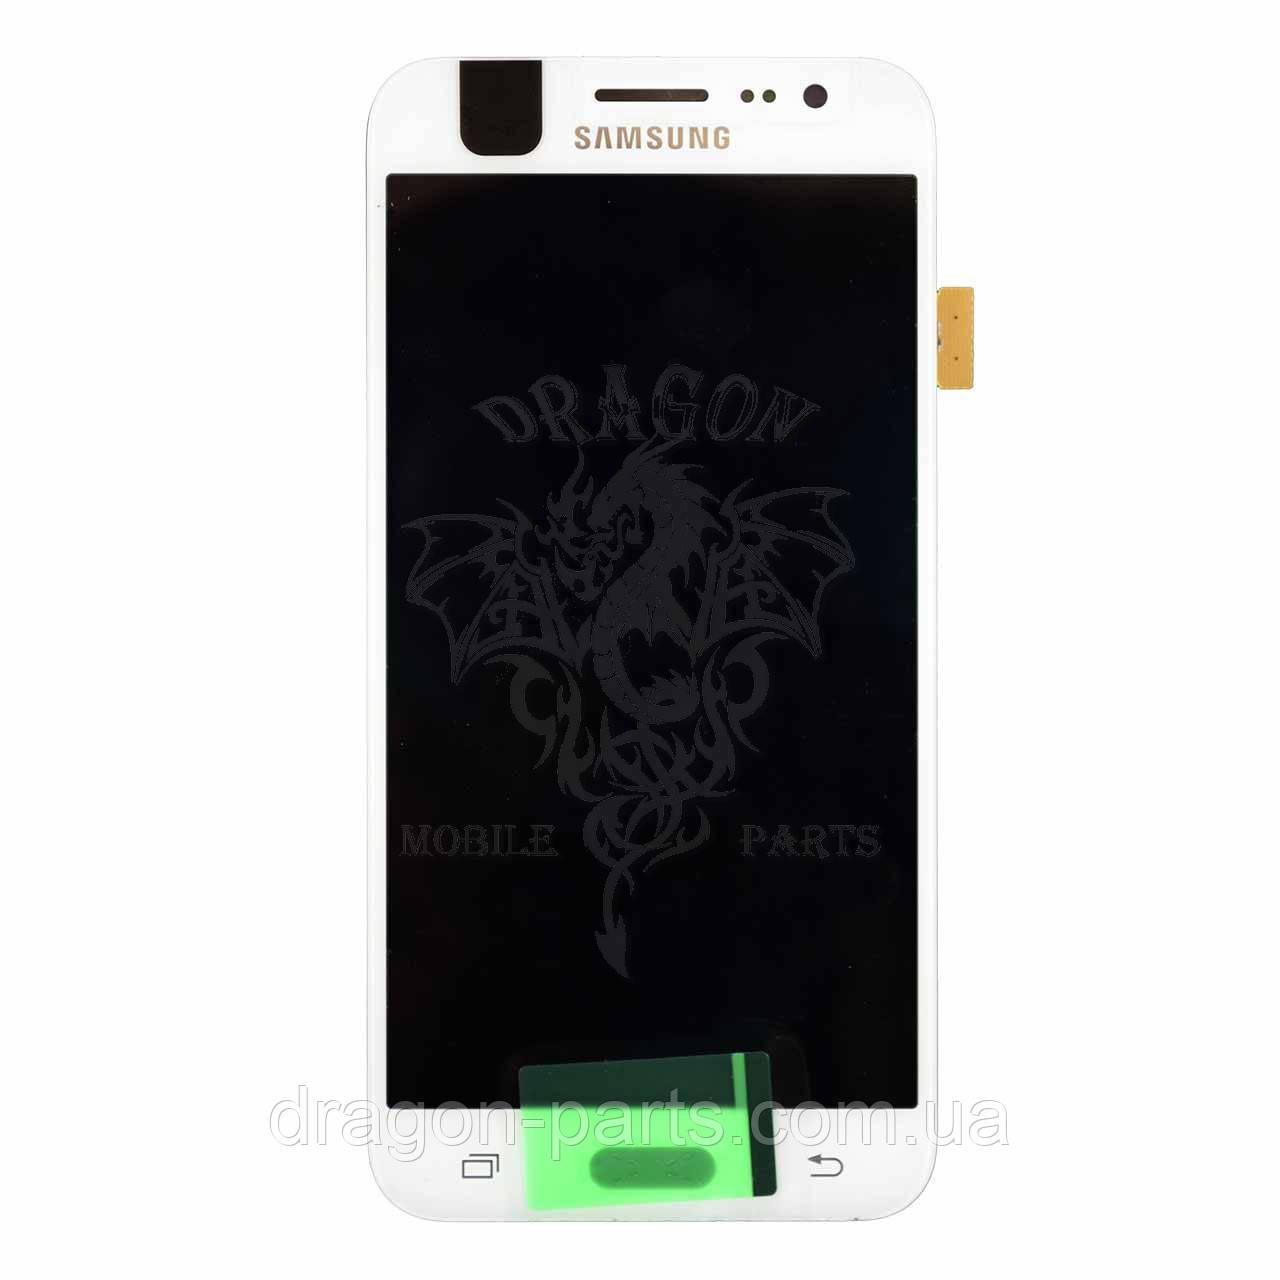 Дисплей Samsung J500 Galaxy J5 с сенсором Белый White оригинал , GH97-17667A